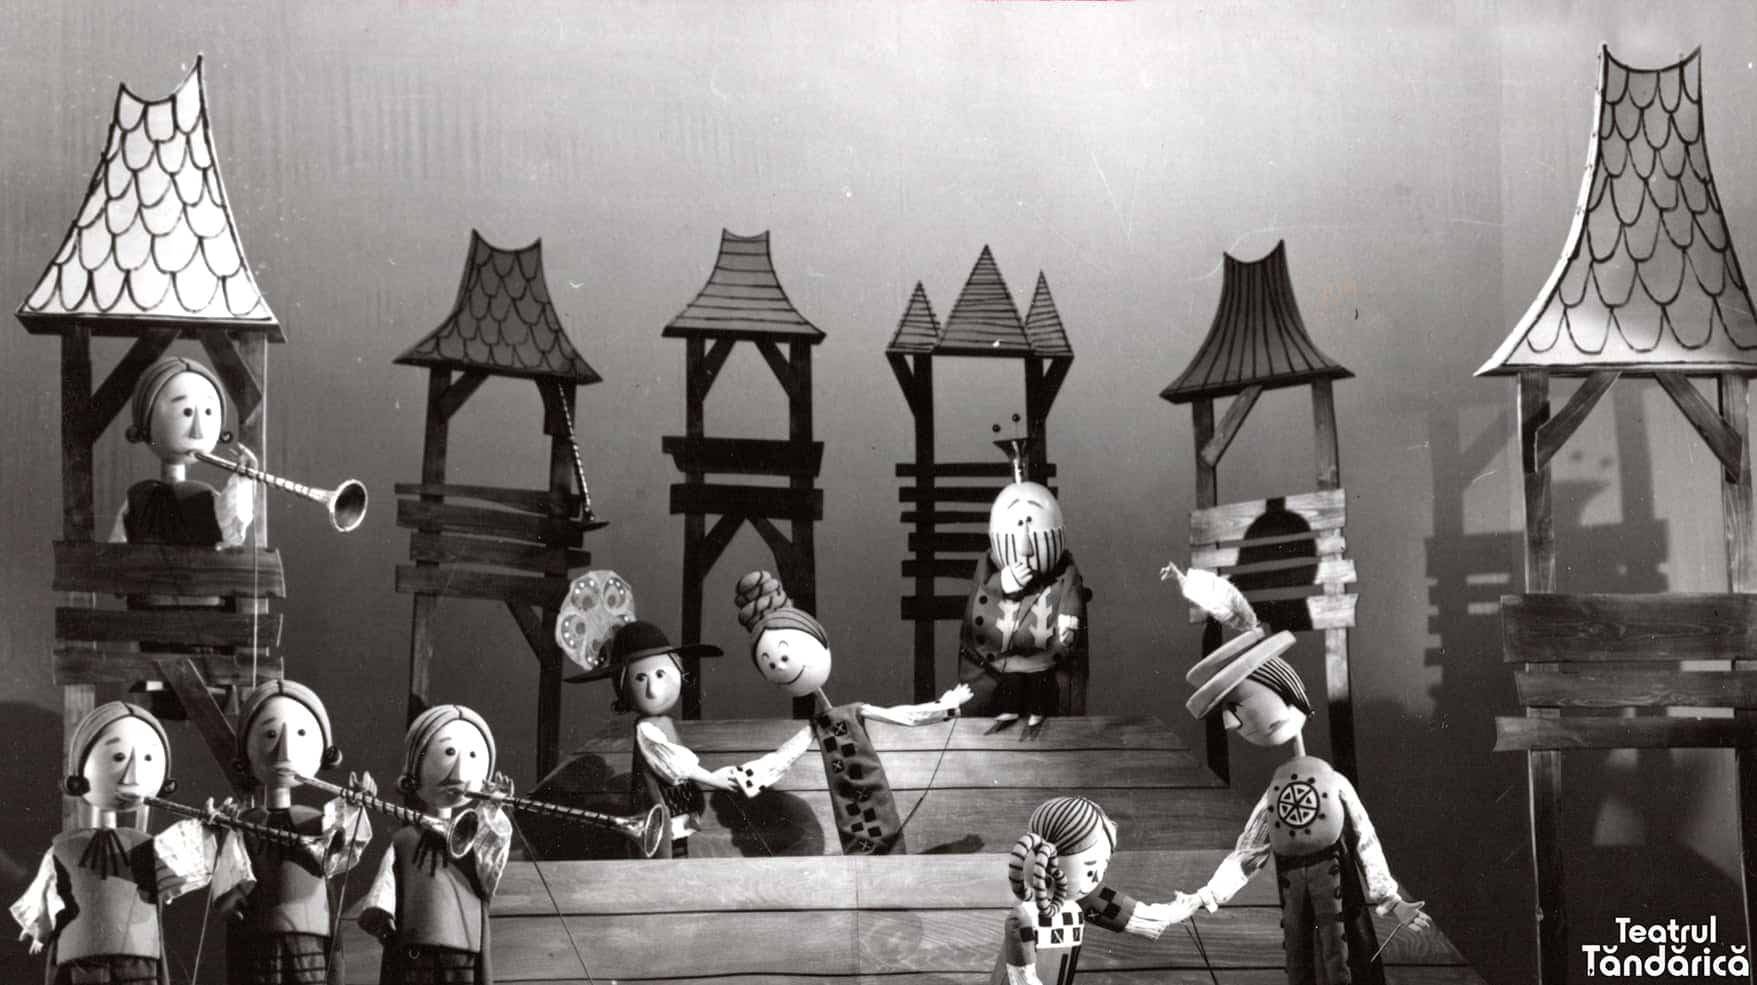 Teatrul-Tandarica-75-ani-episodul-14-7-1